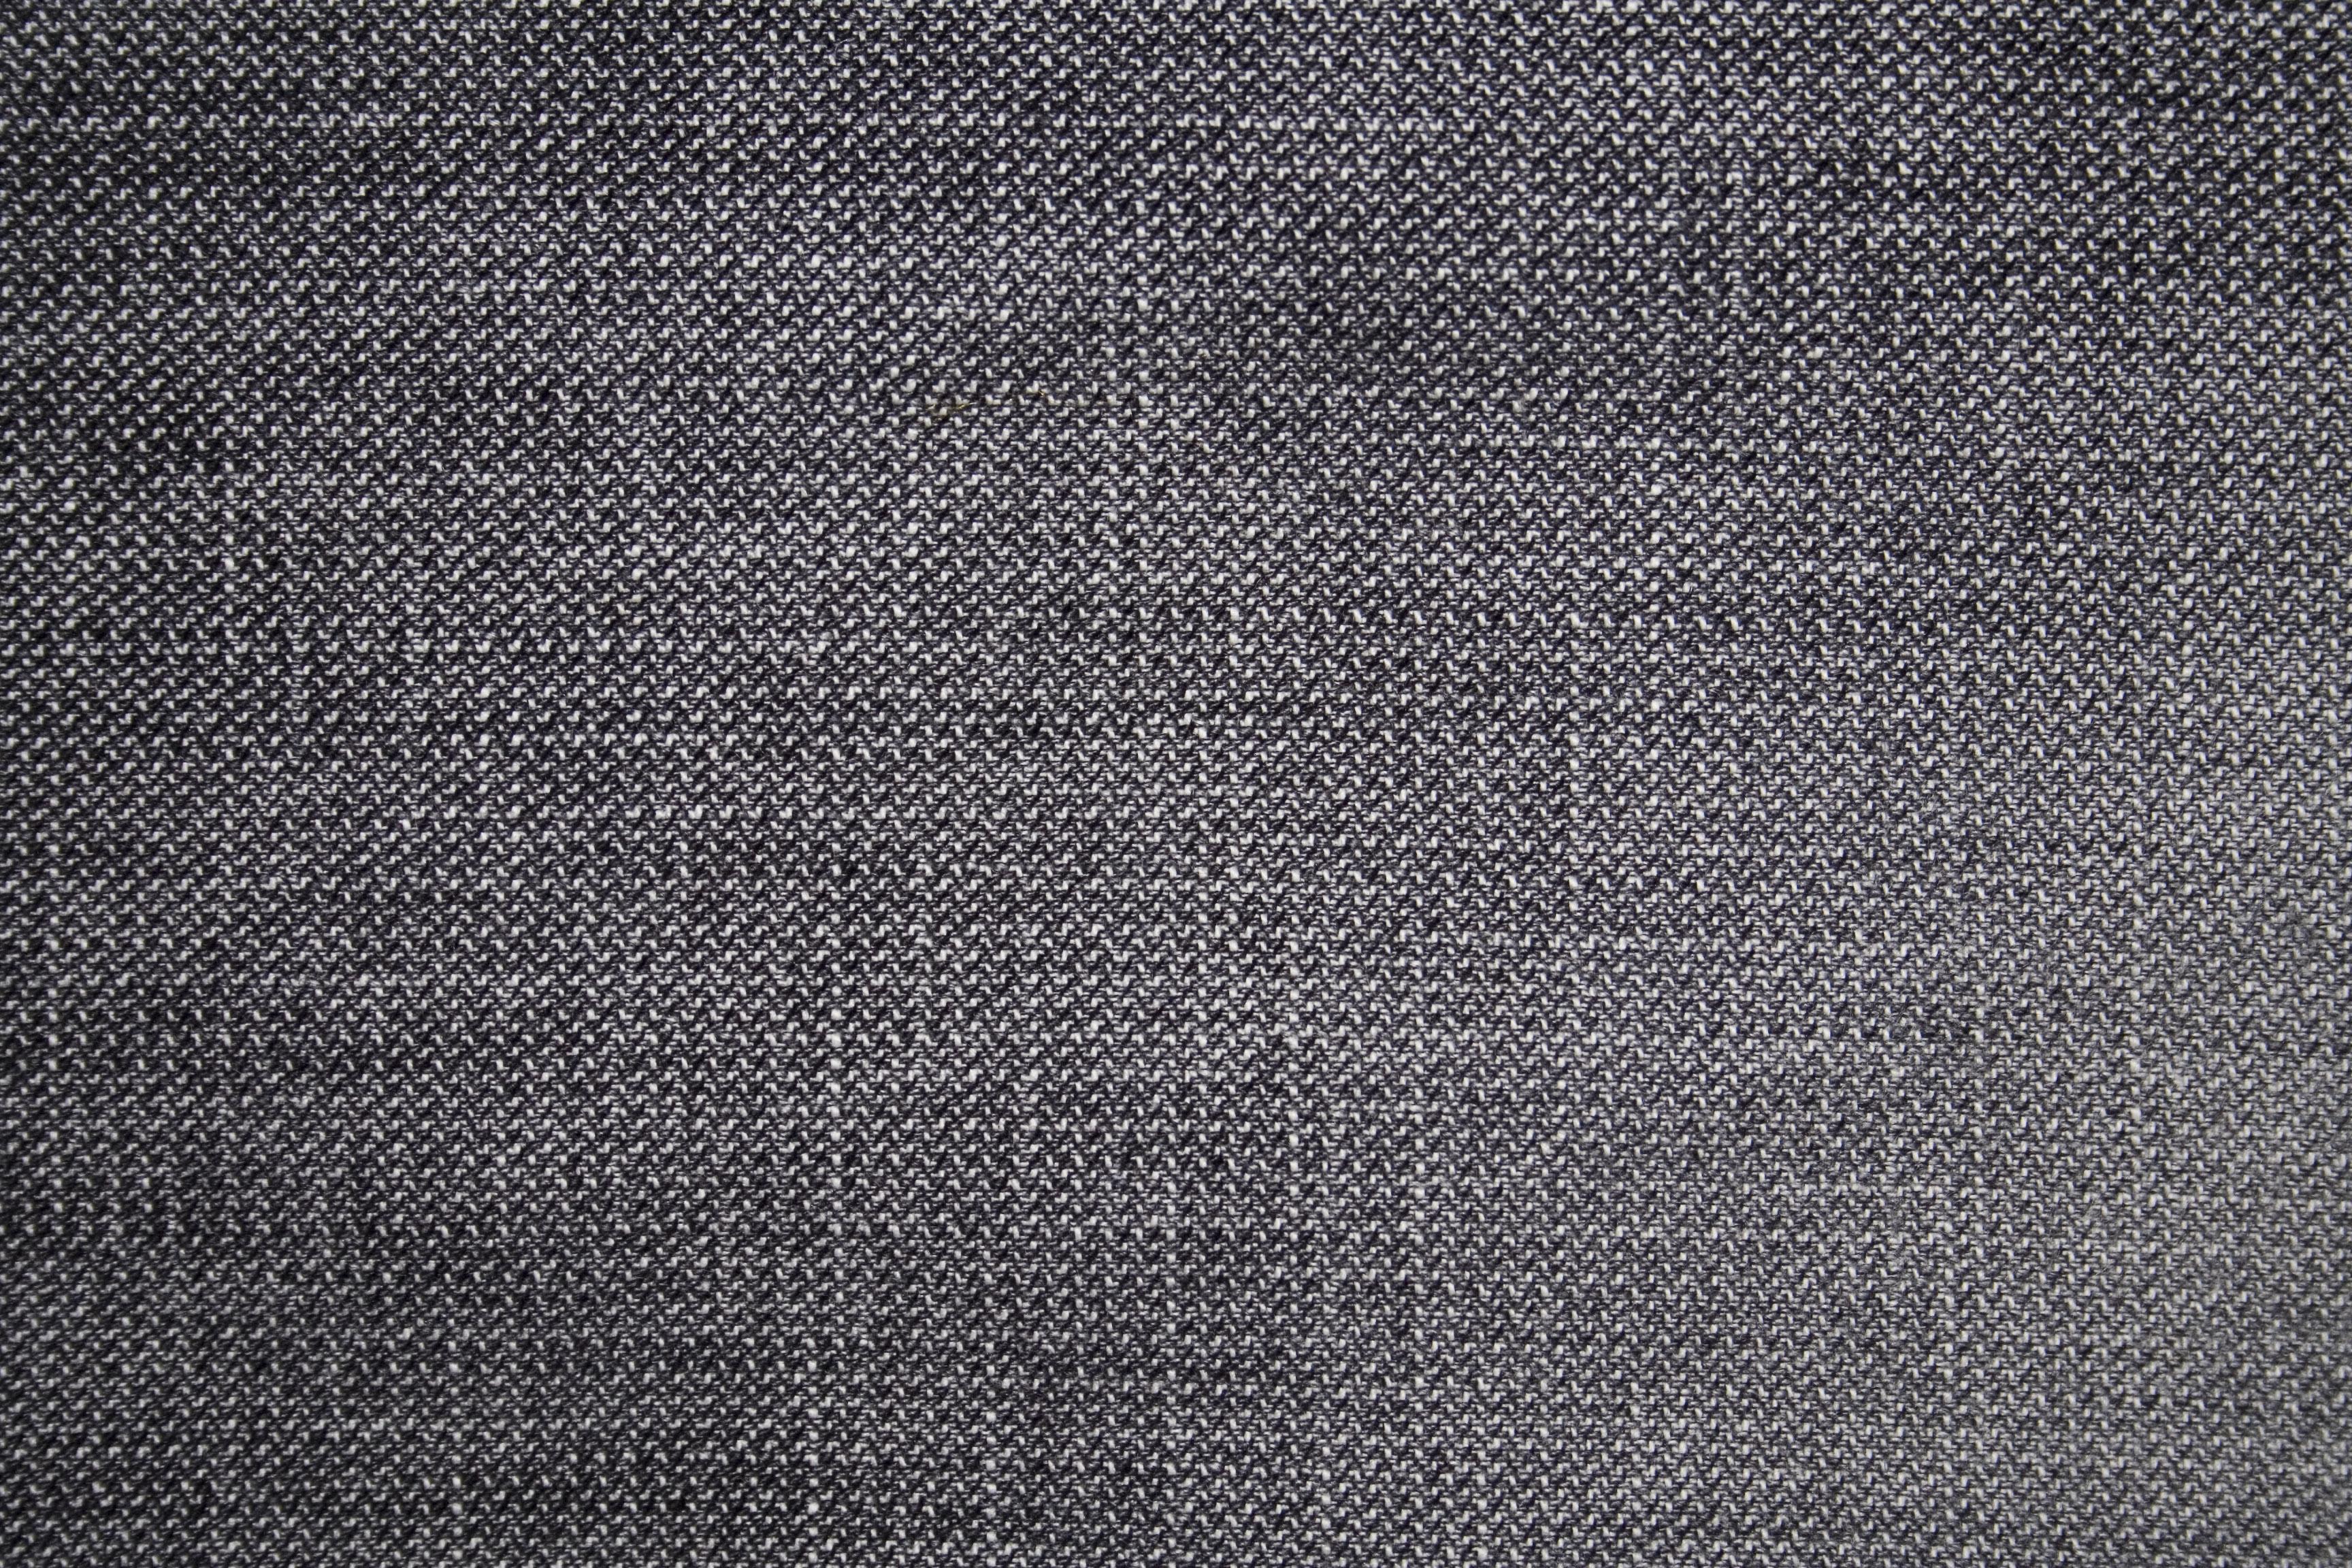 Farmer textile texture closeup | Textures for photoshop free